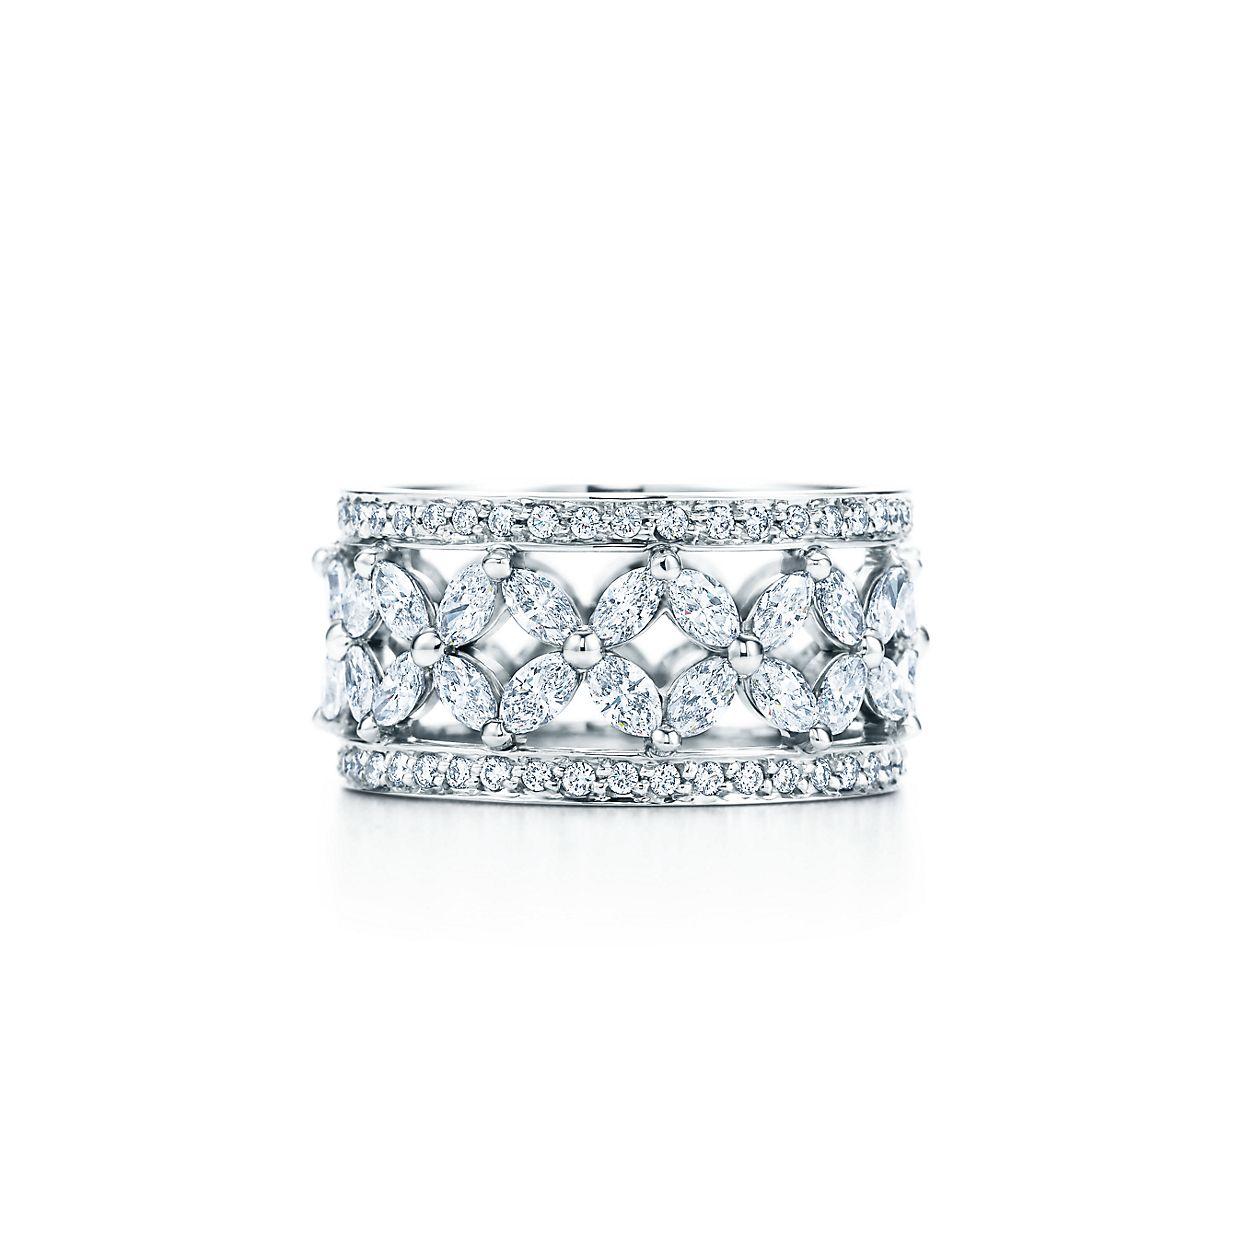 Кольцо Tiffany Victoria™ из платины с бриллиантами.   Tiffany   Co. 4676dfb572c